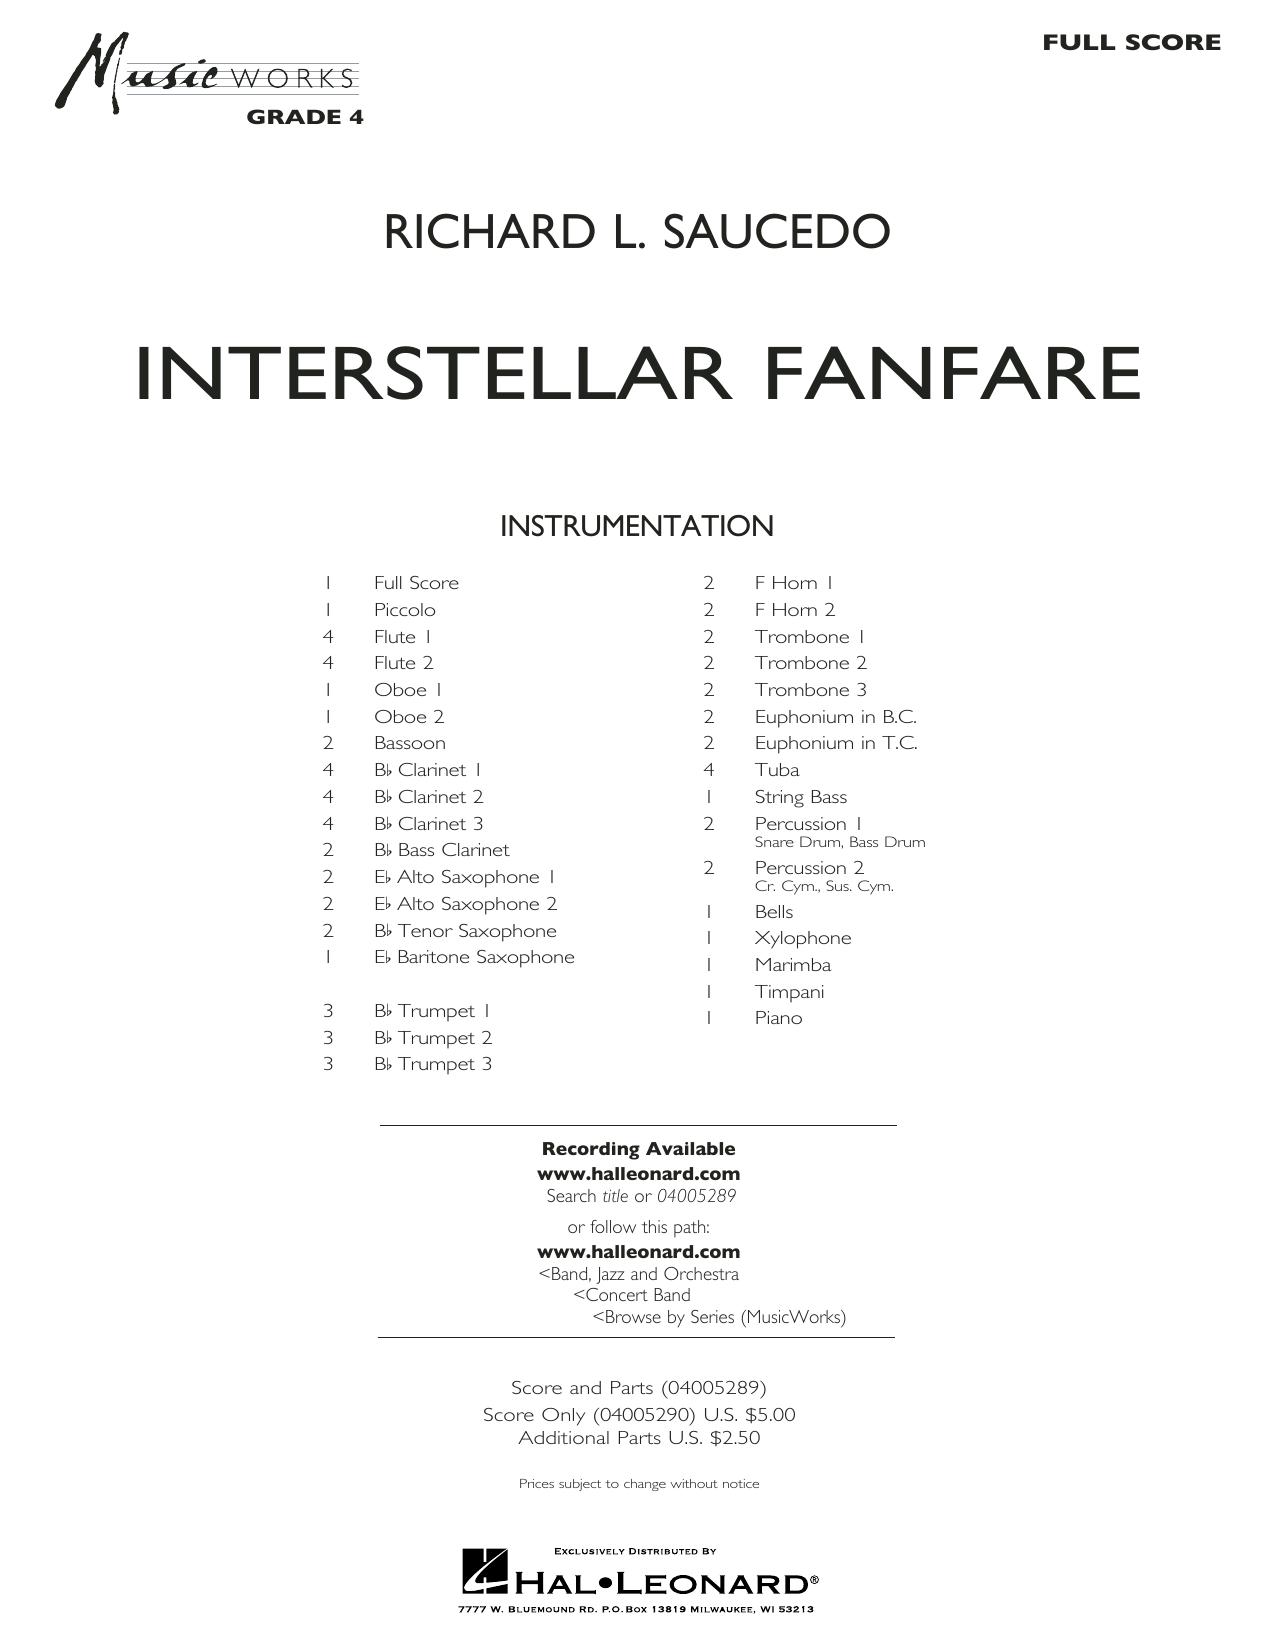 Richard L. Saucedo Interstellar Fanfare - Conductor Score (Full Score) sheet music notes printable PDF score